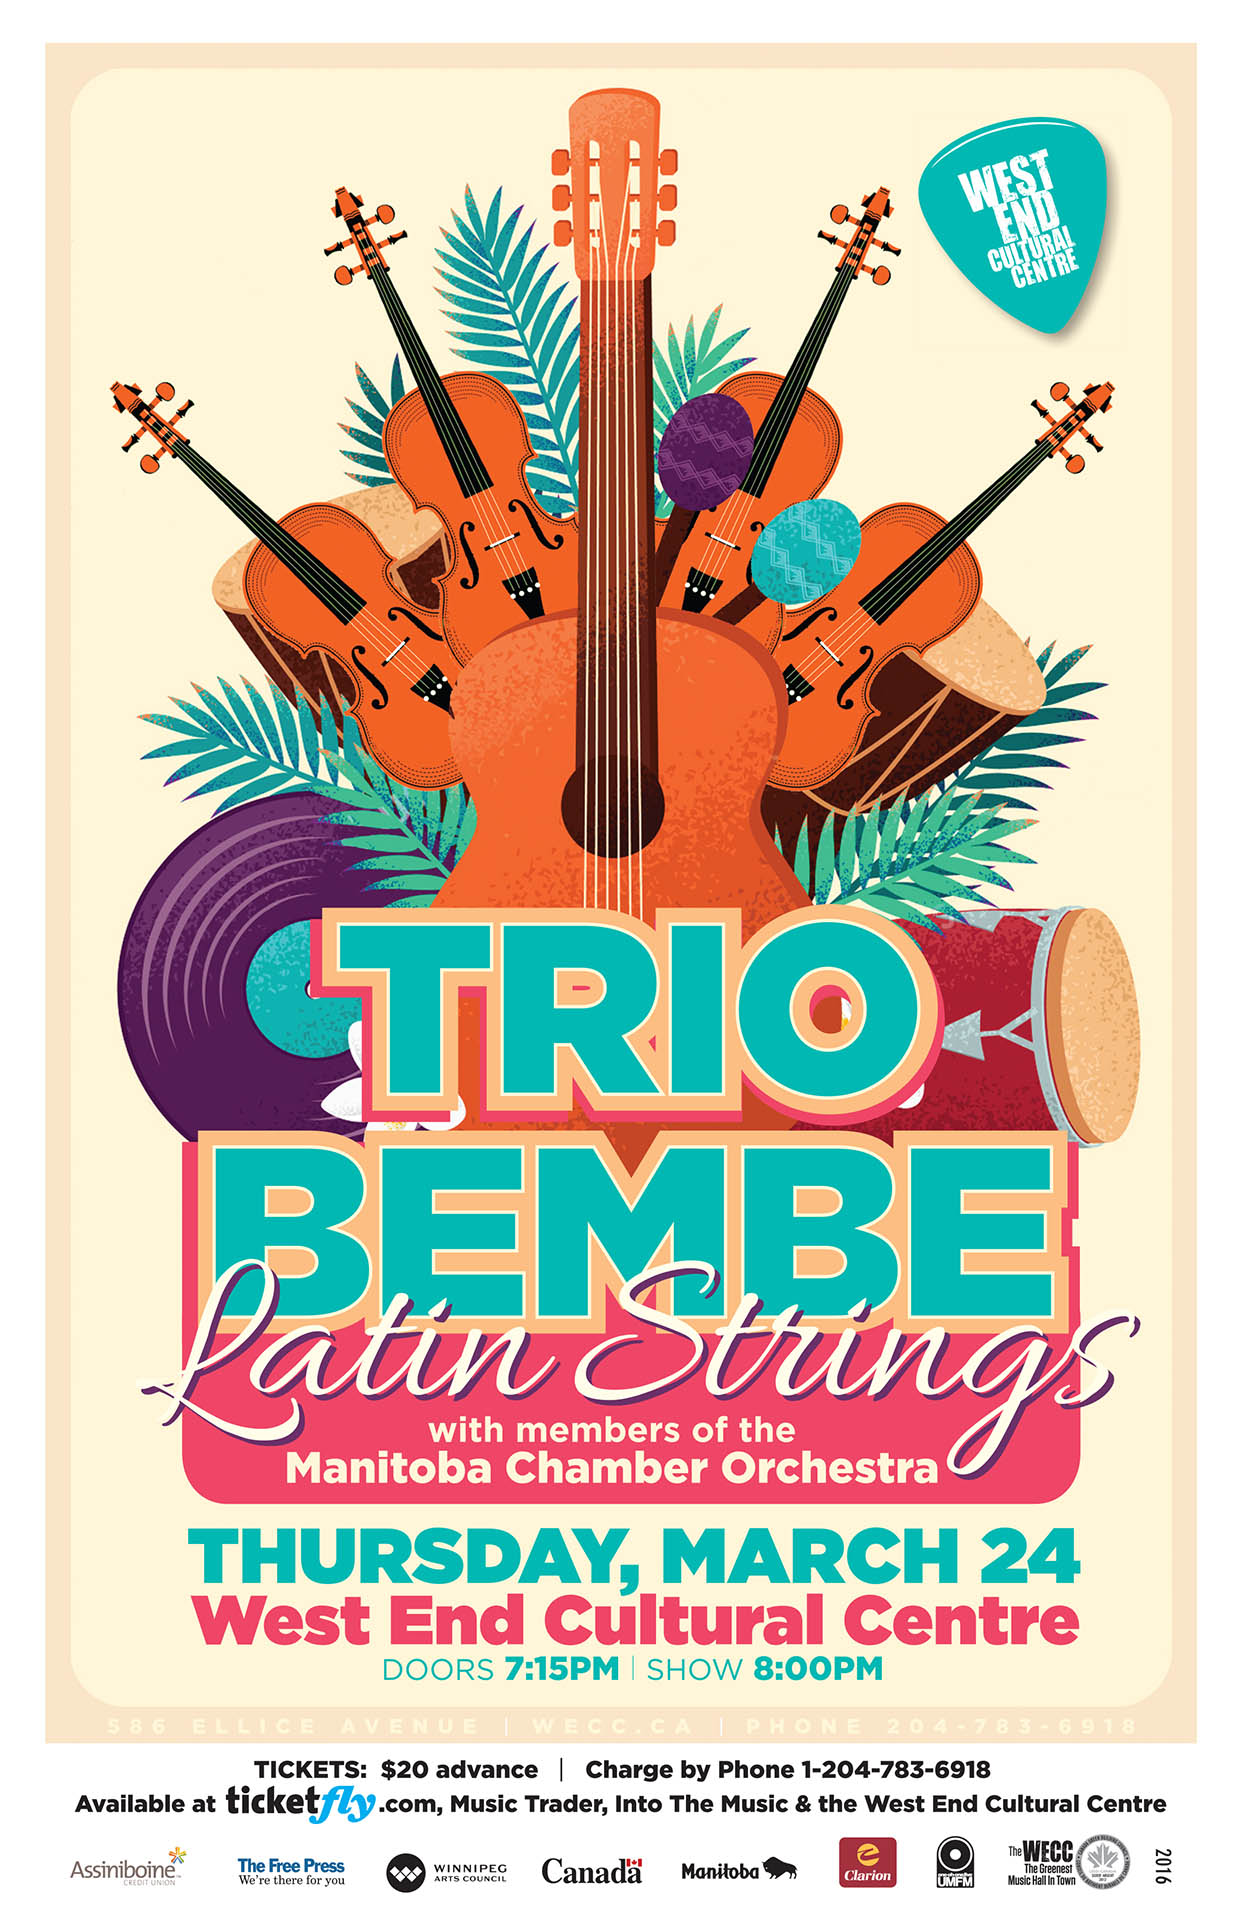 Trio Bembe Latin Strings - 2015